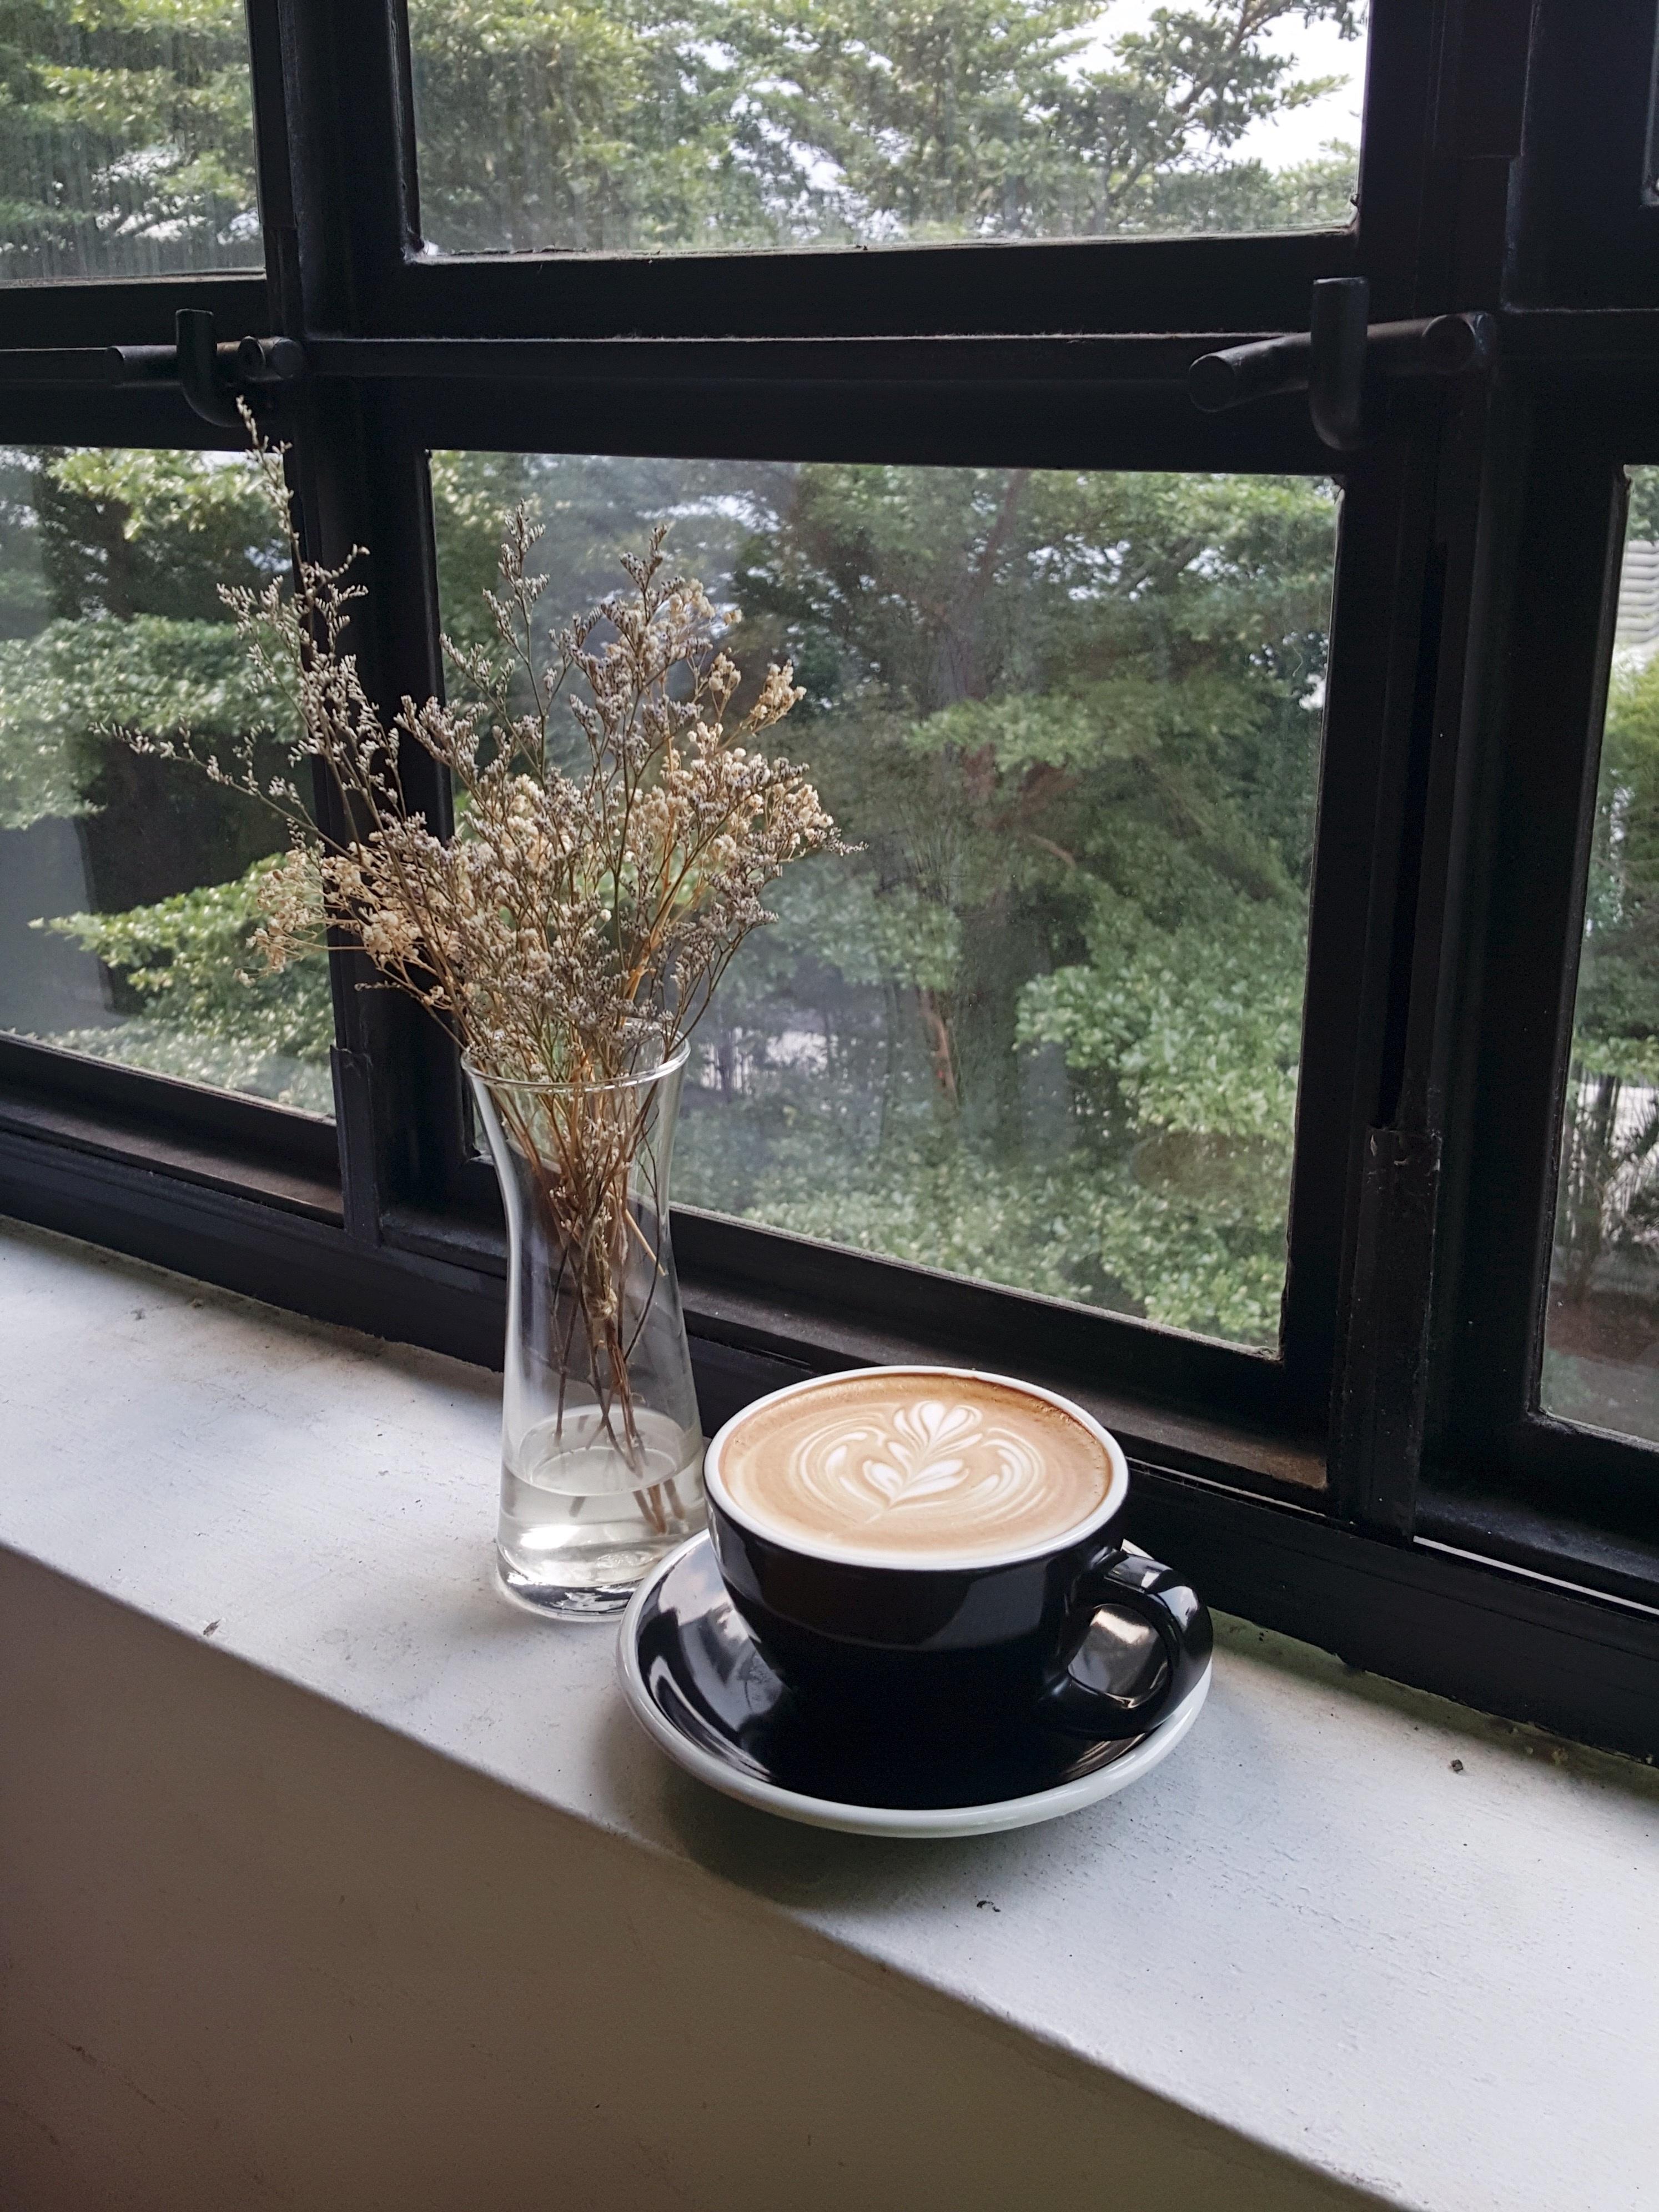 Gratis Afbeeldingen : tafel, koffie, hout, bloem, venster, glas ...